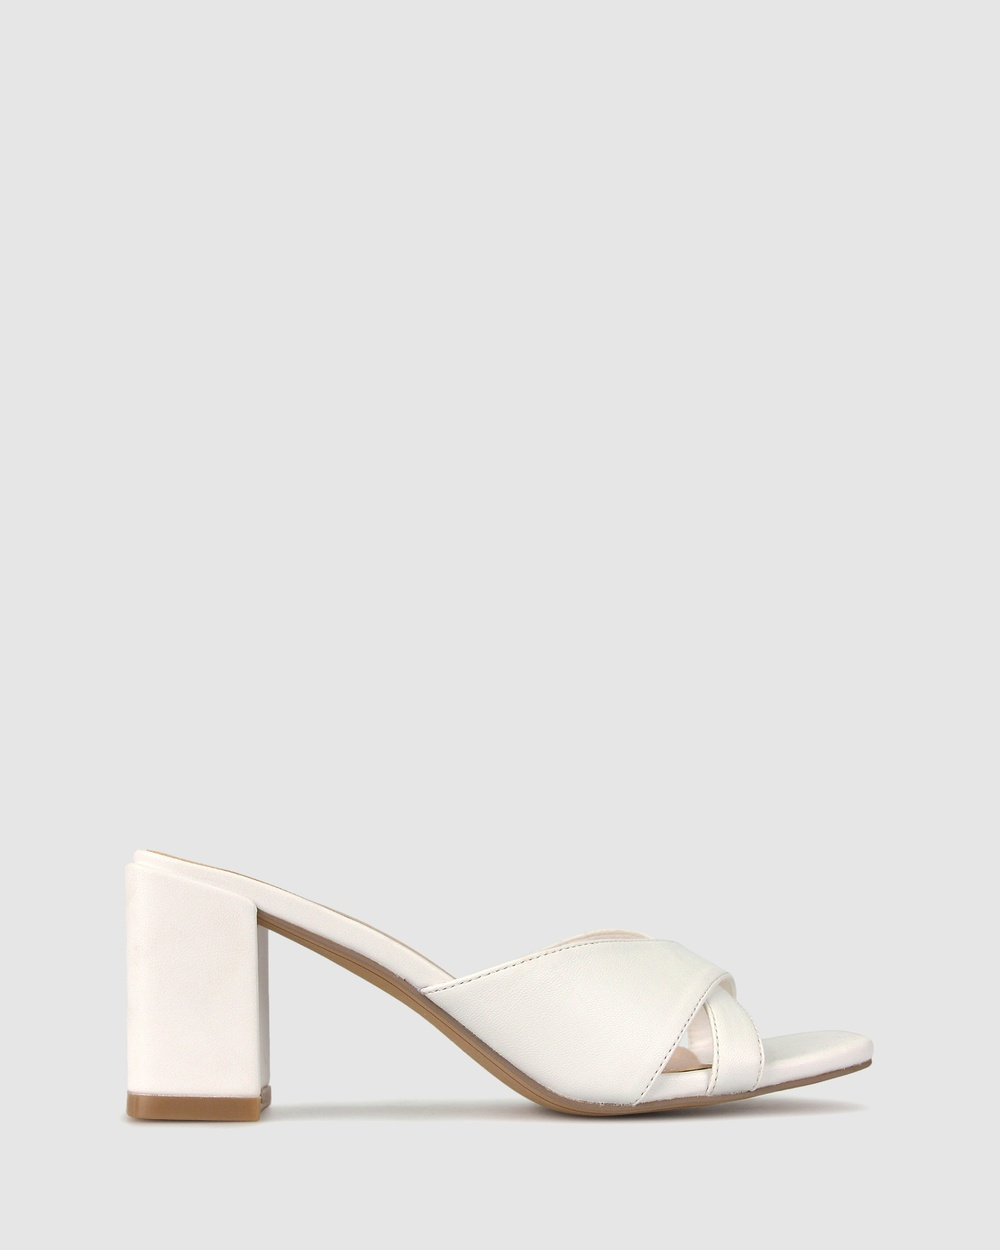 Betts Lillydale Block Heel Mules Sandals White Australia